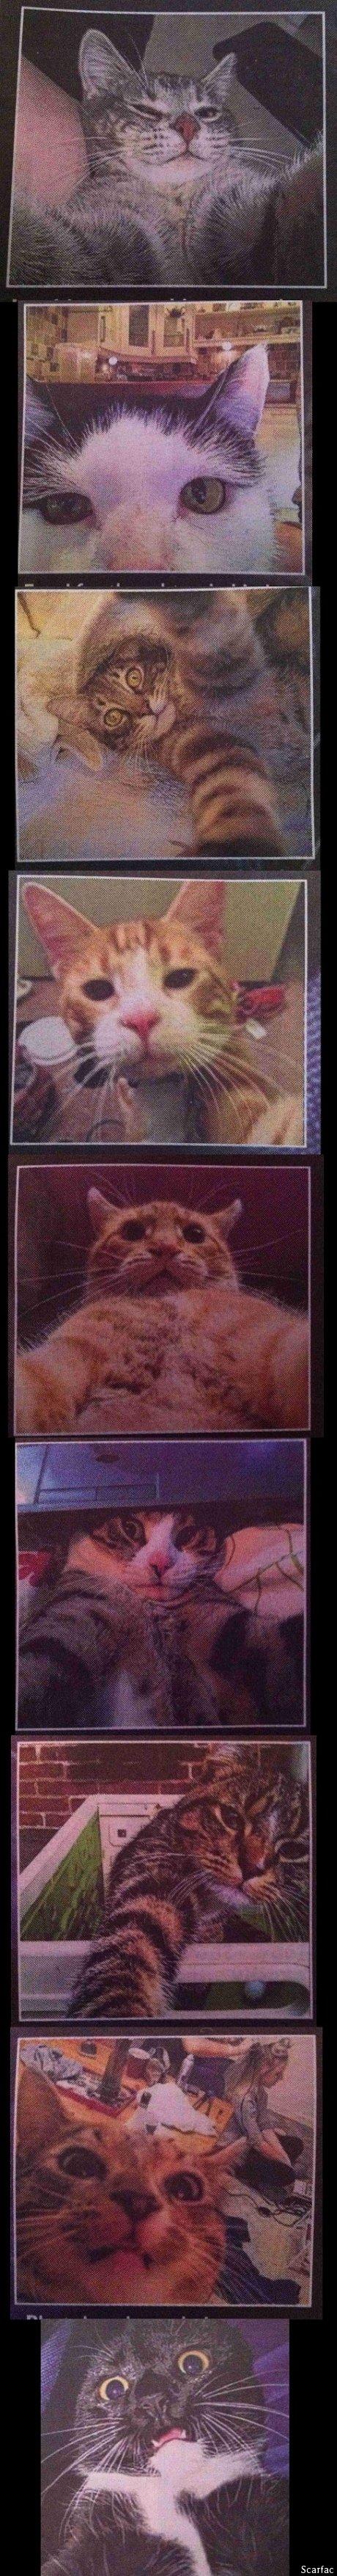 Cat Selfies. .. Cat's expression Cat Selfies Cat's expression